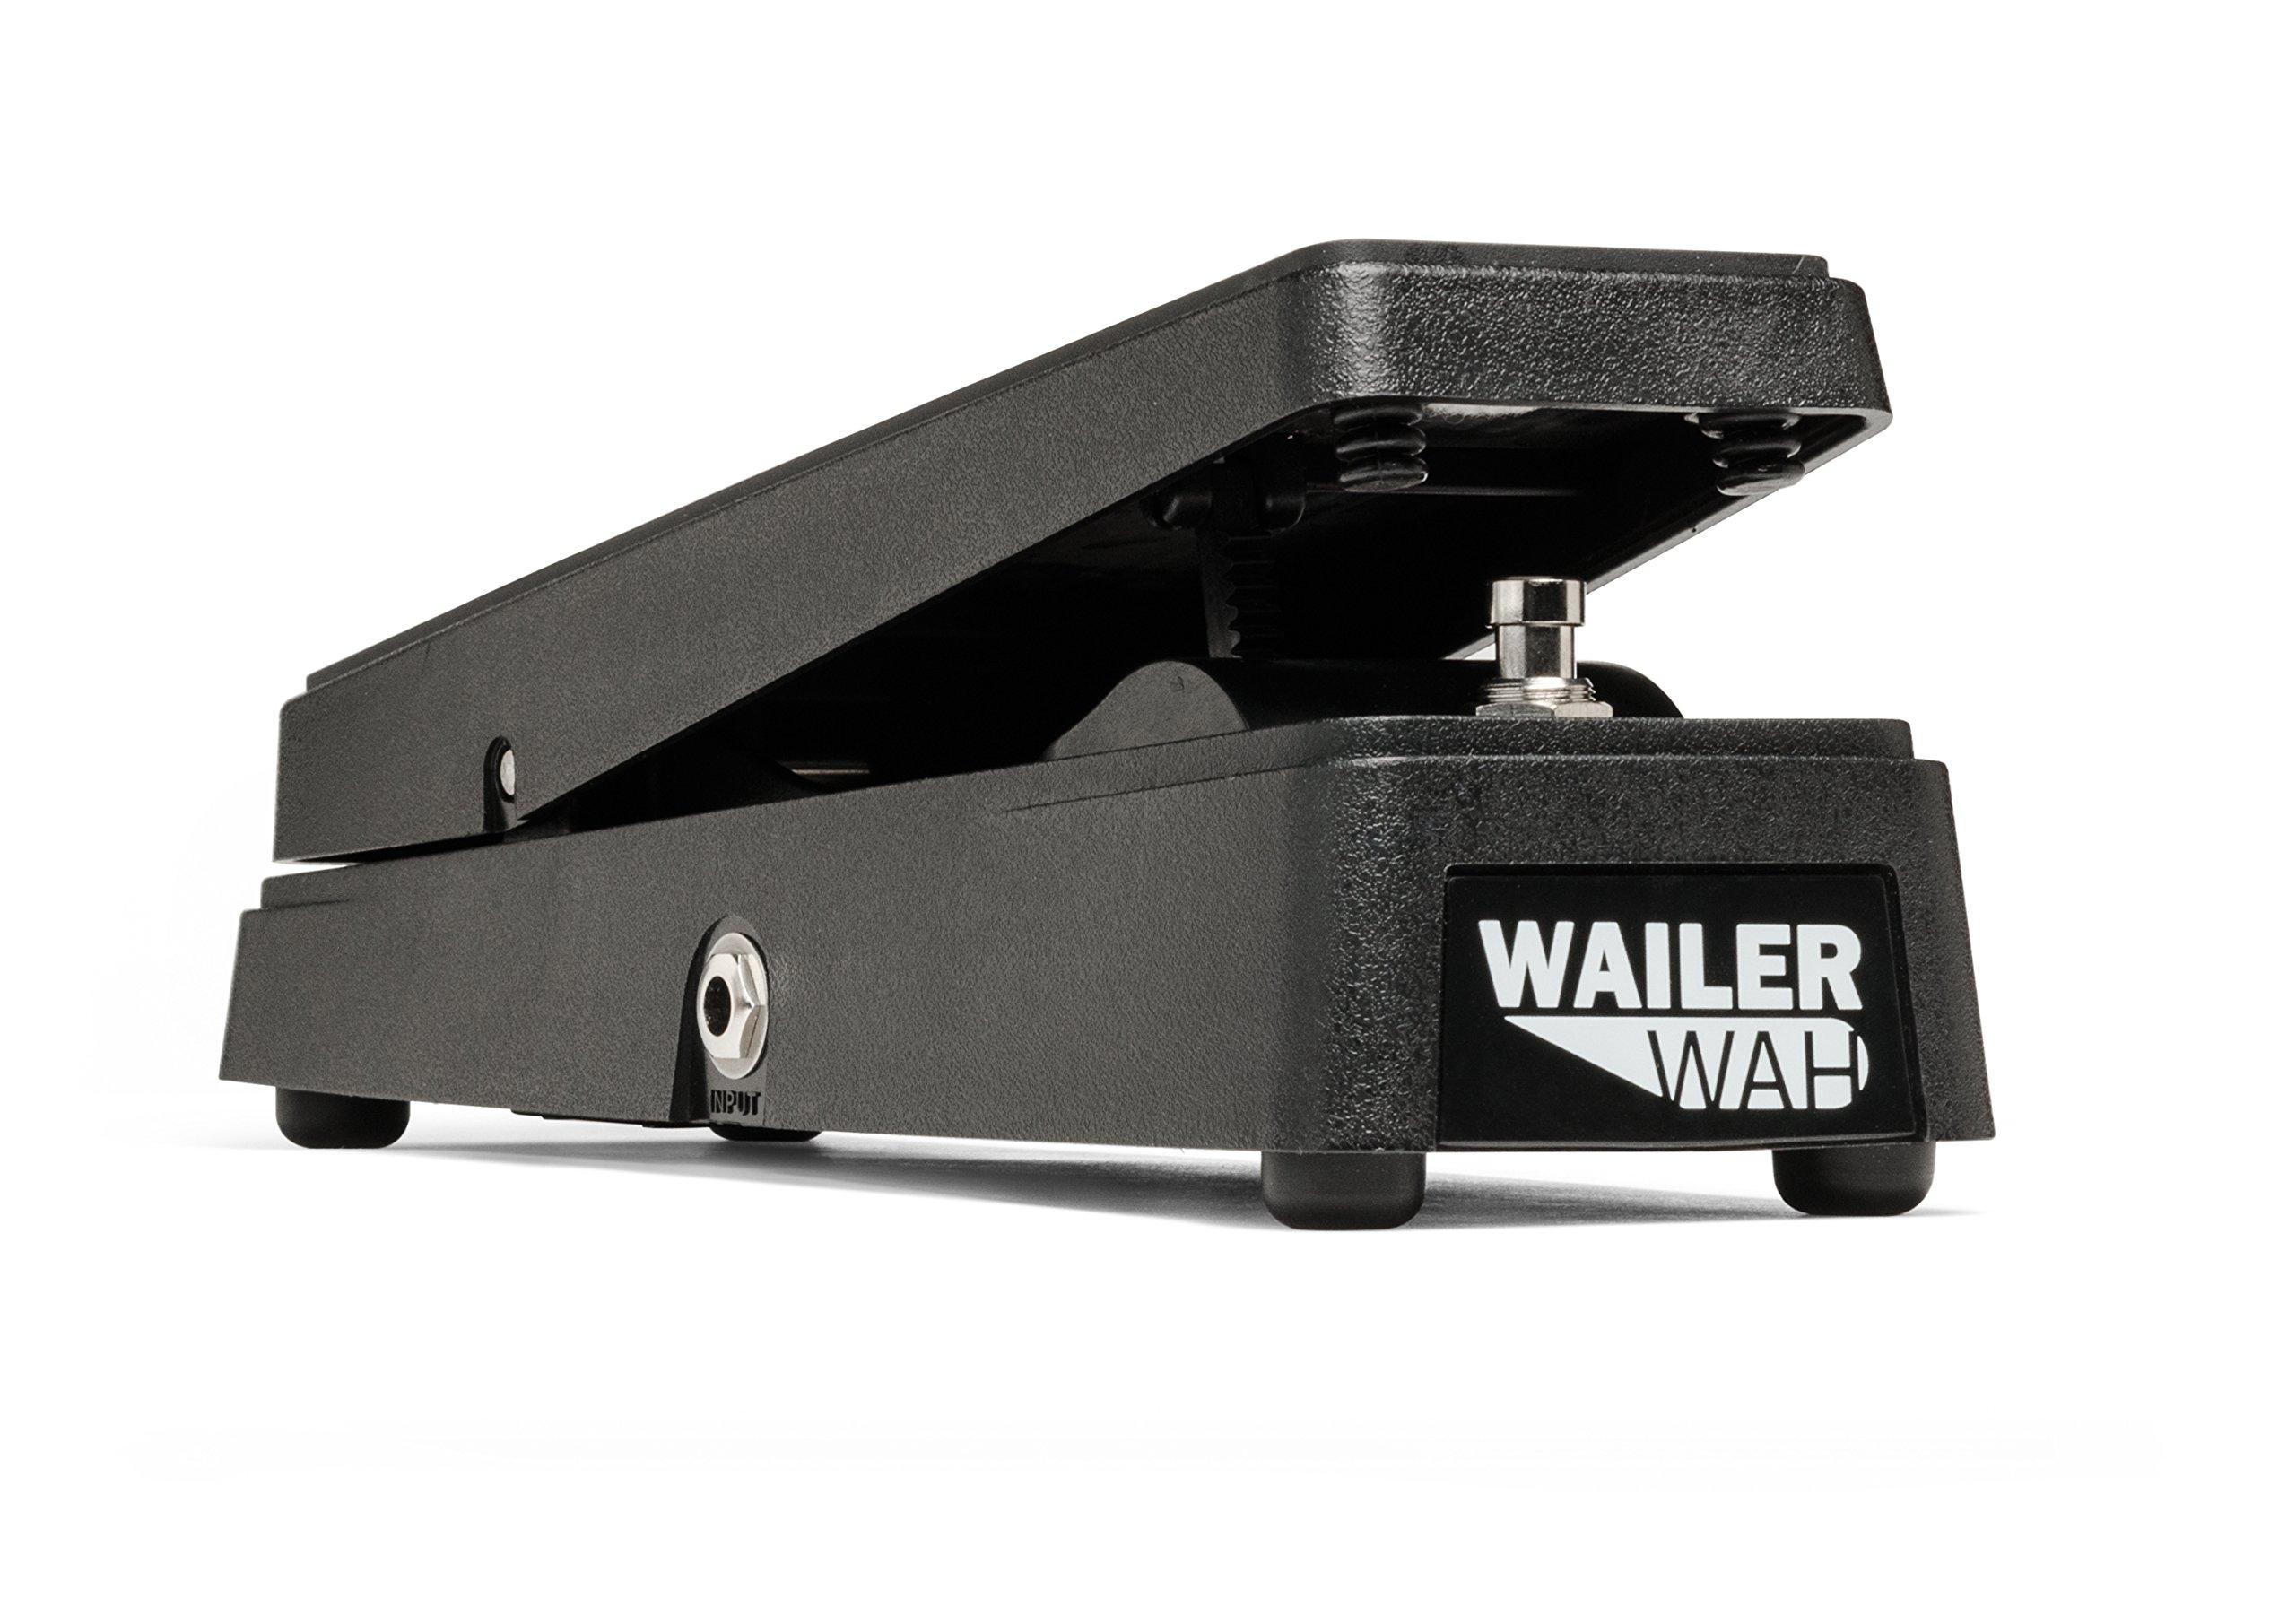 Electro-Harmonix WAILER WAH Guitar Effect Pedal